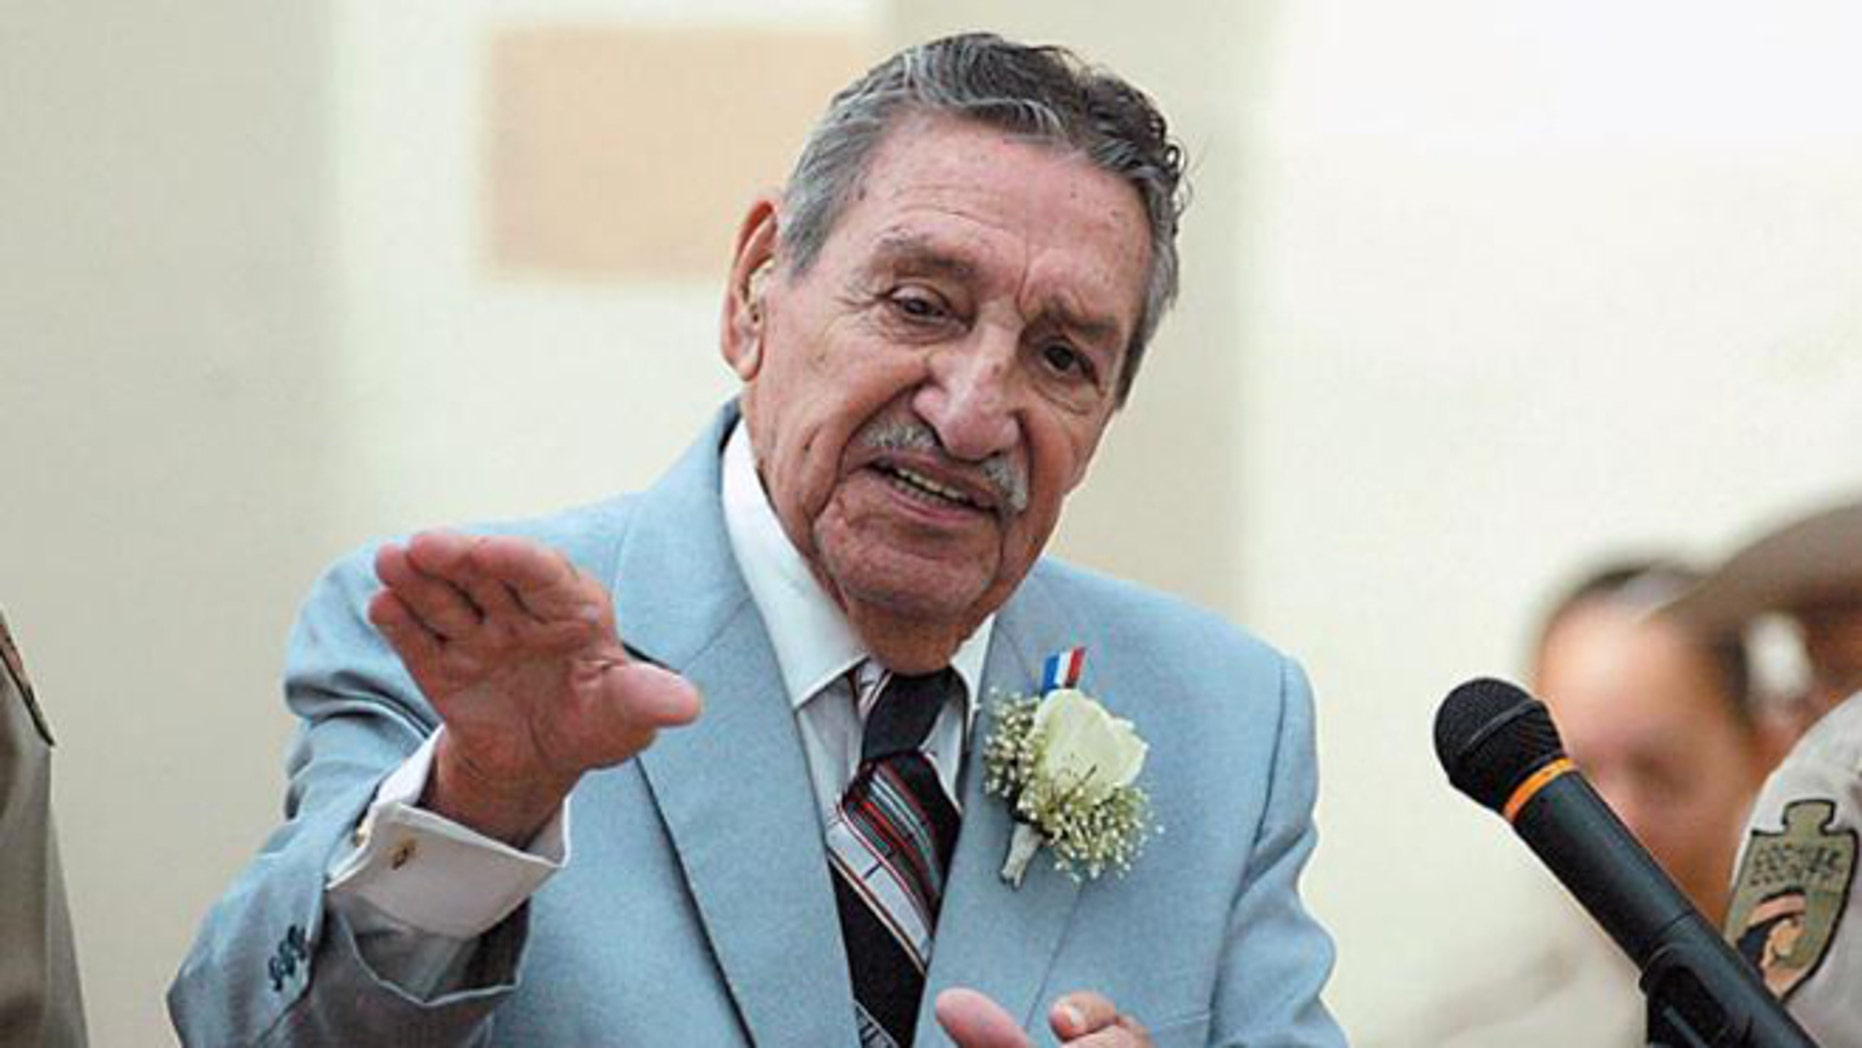 Raul Hector Castro in a 2006 file photo.